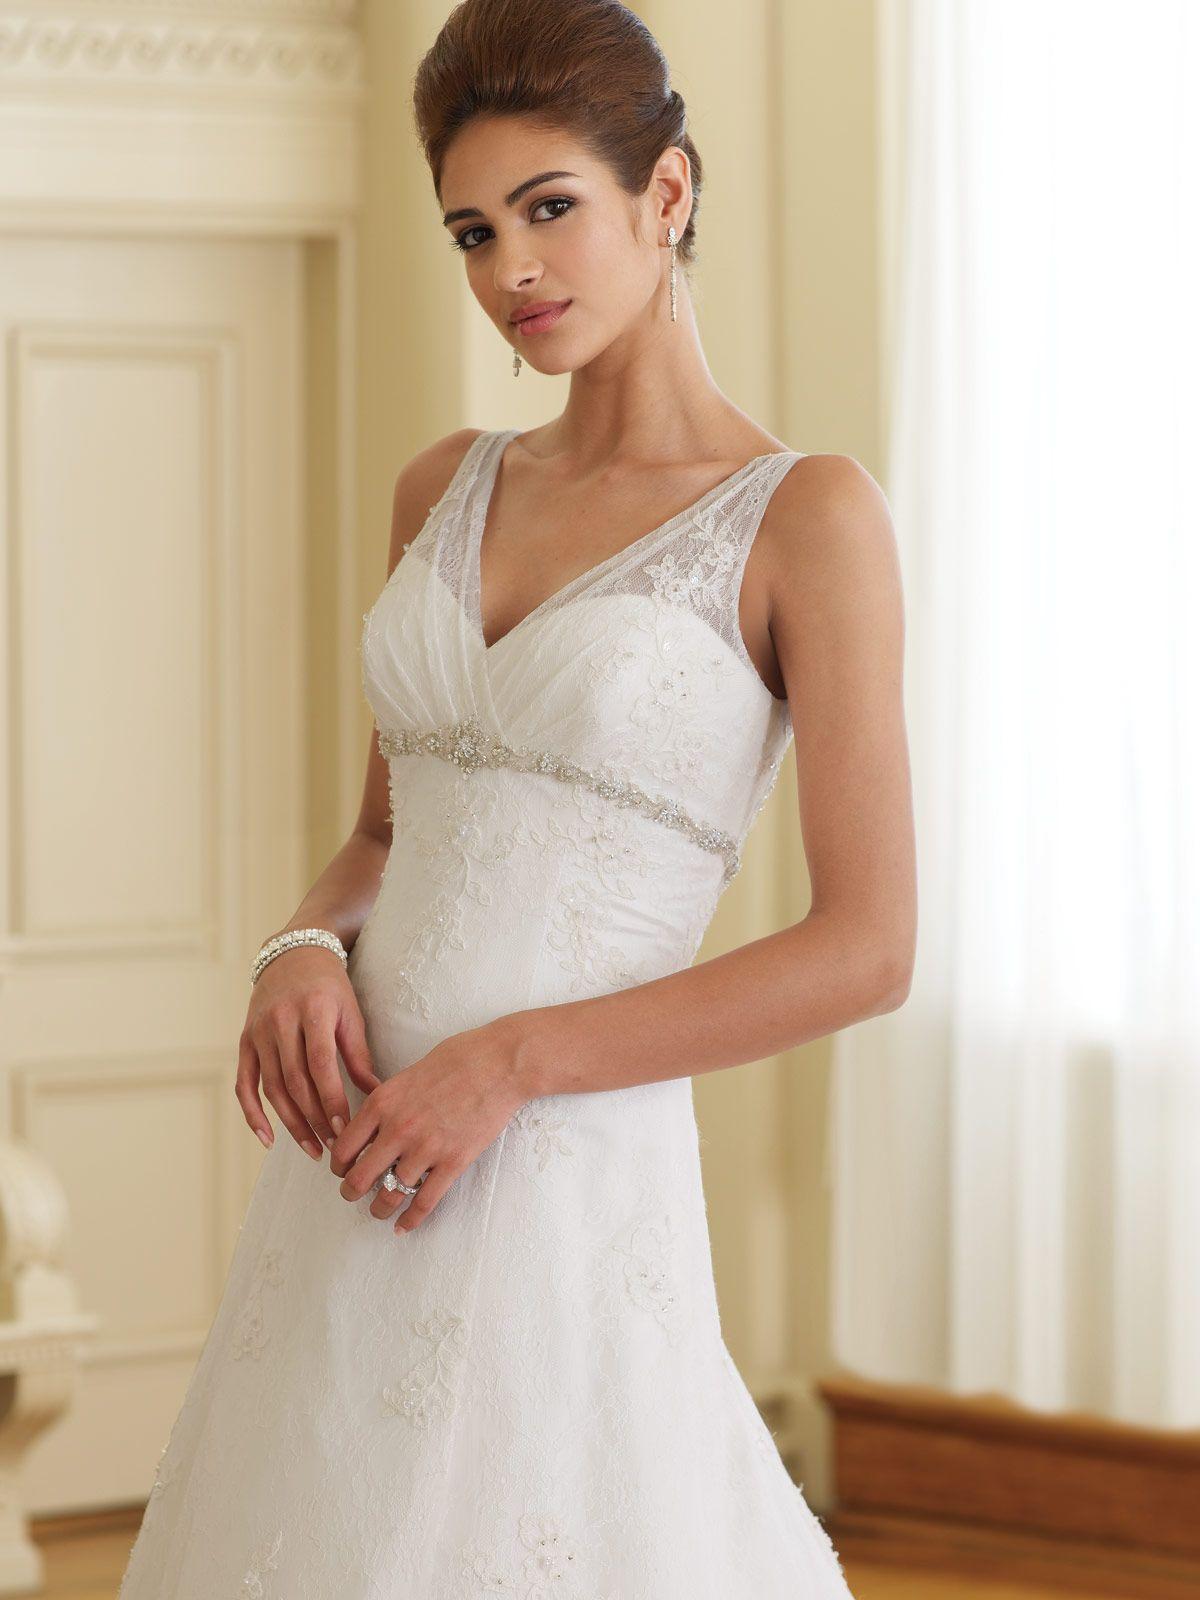 Wedding Table Petite Wedding Dresses best wedding dress for petite brides choose suitable dresses